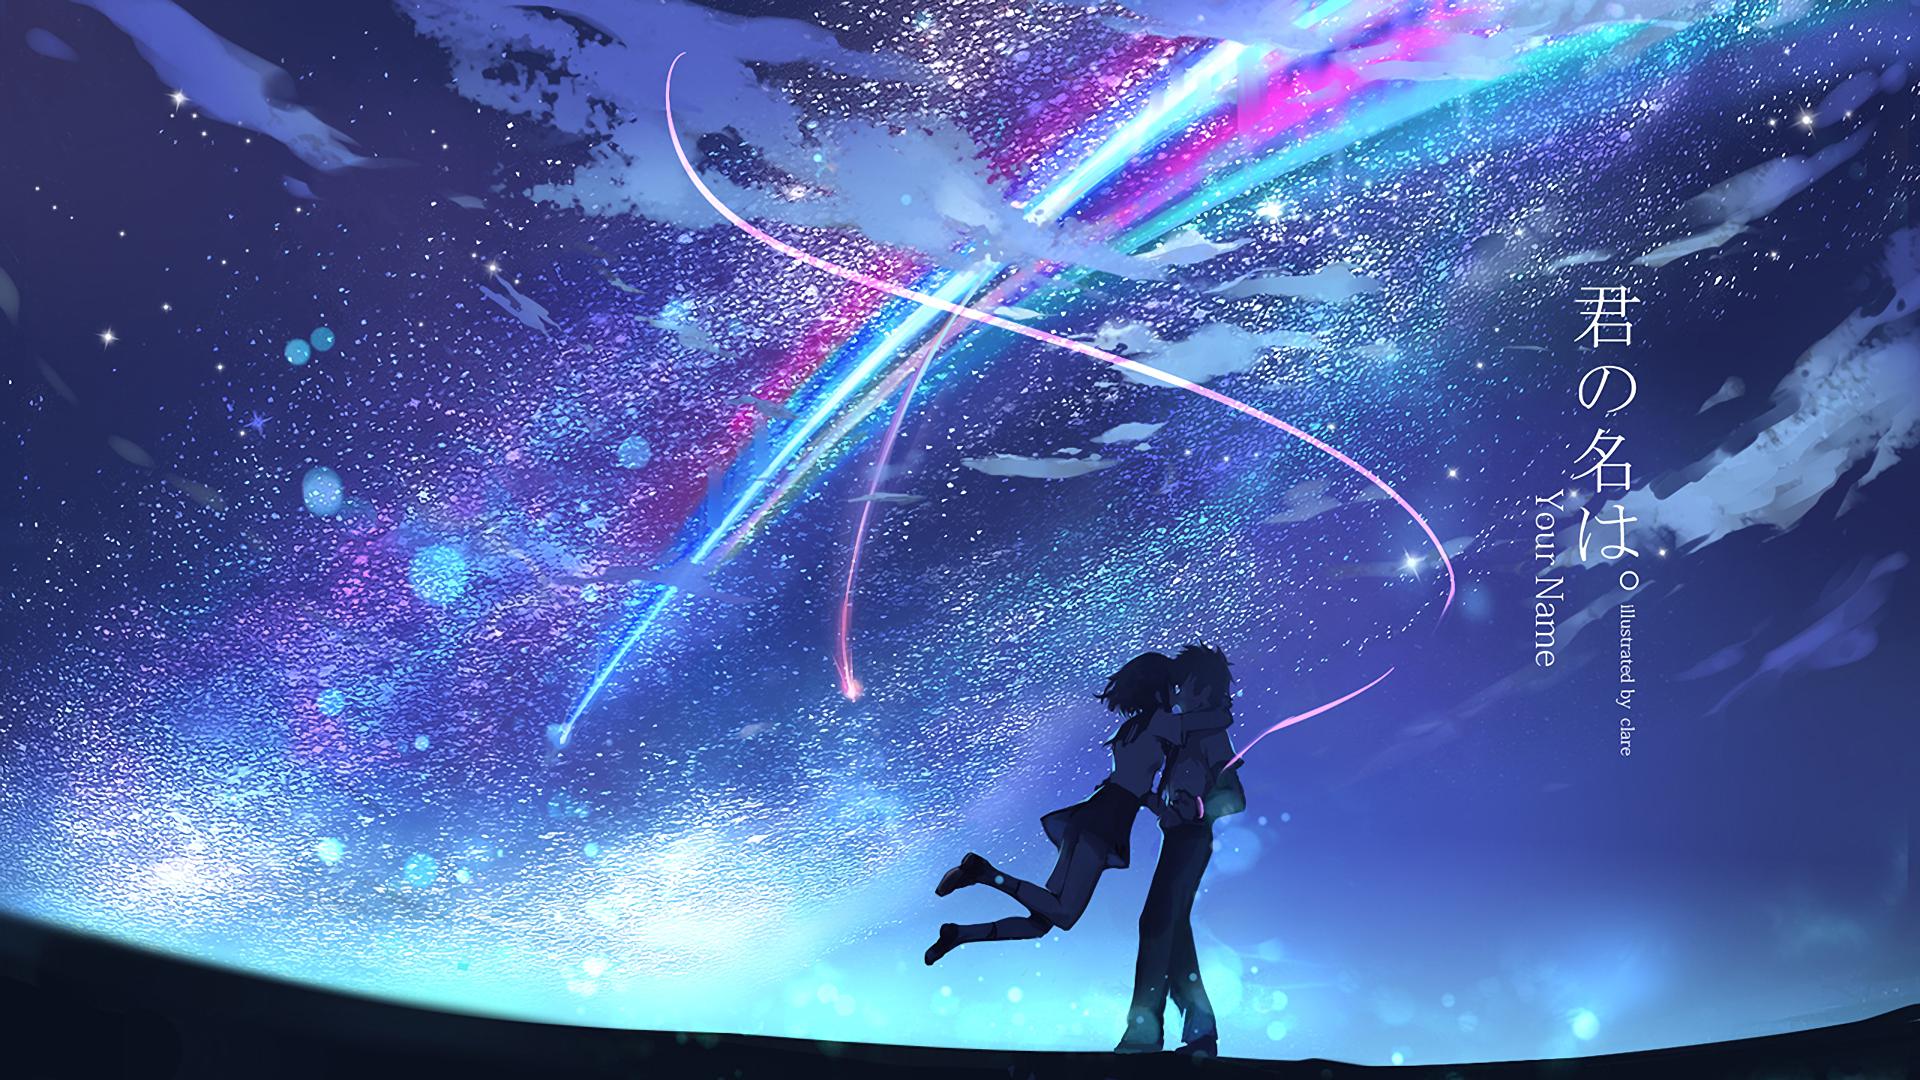 Kimi No Na Wa My Favourite Movie Otaku Central Anime Review